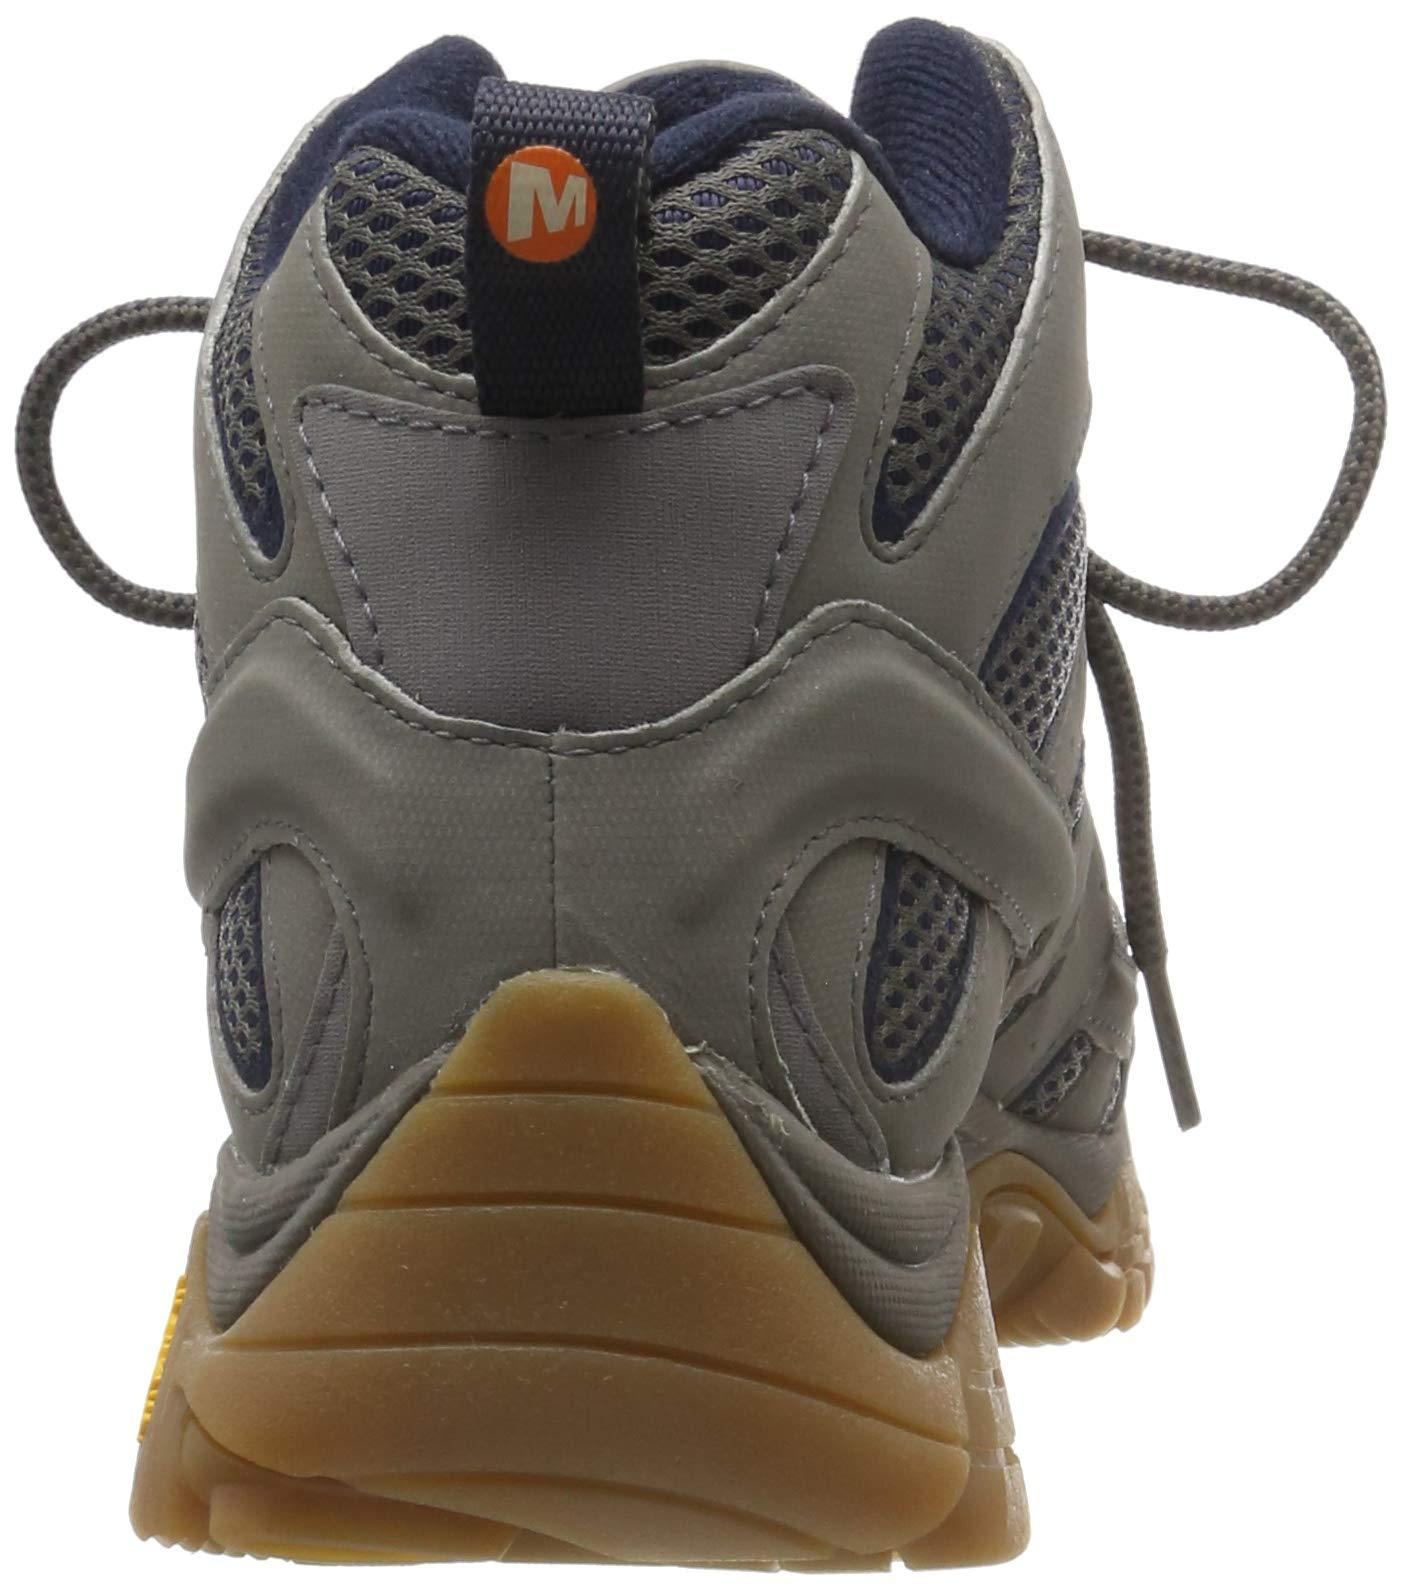 Merrell Men's Moab 2 Mid Gore-tex High Rise Hiking Shoes 2